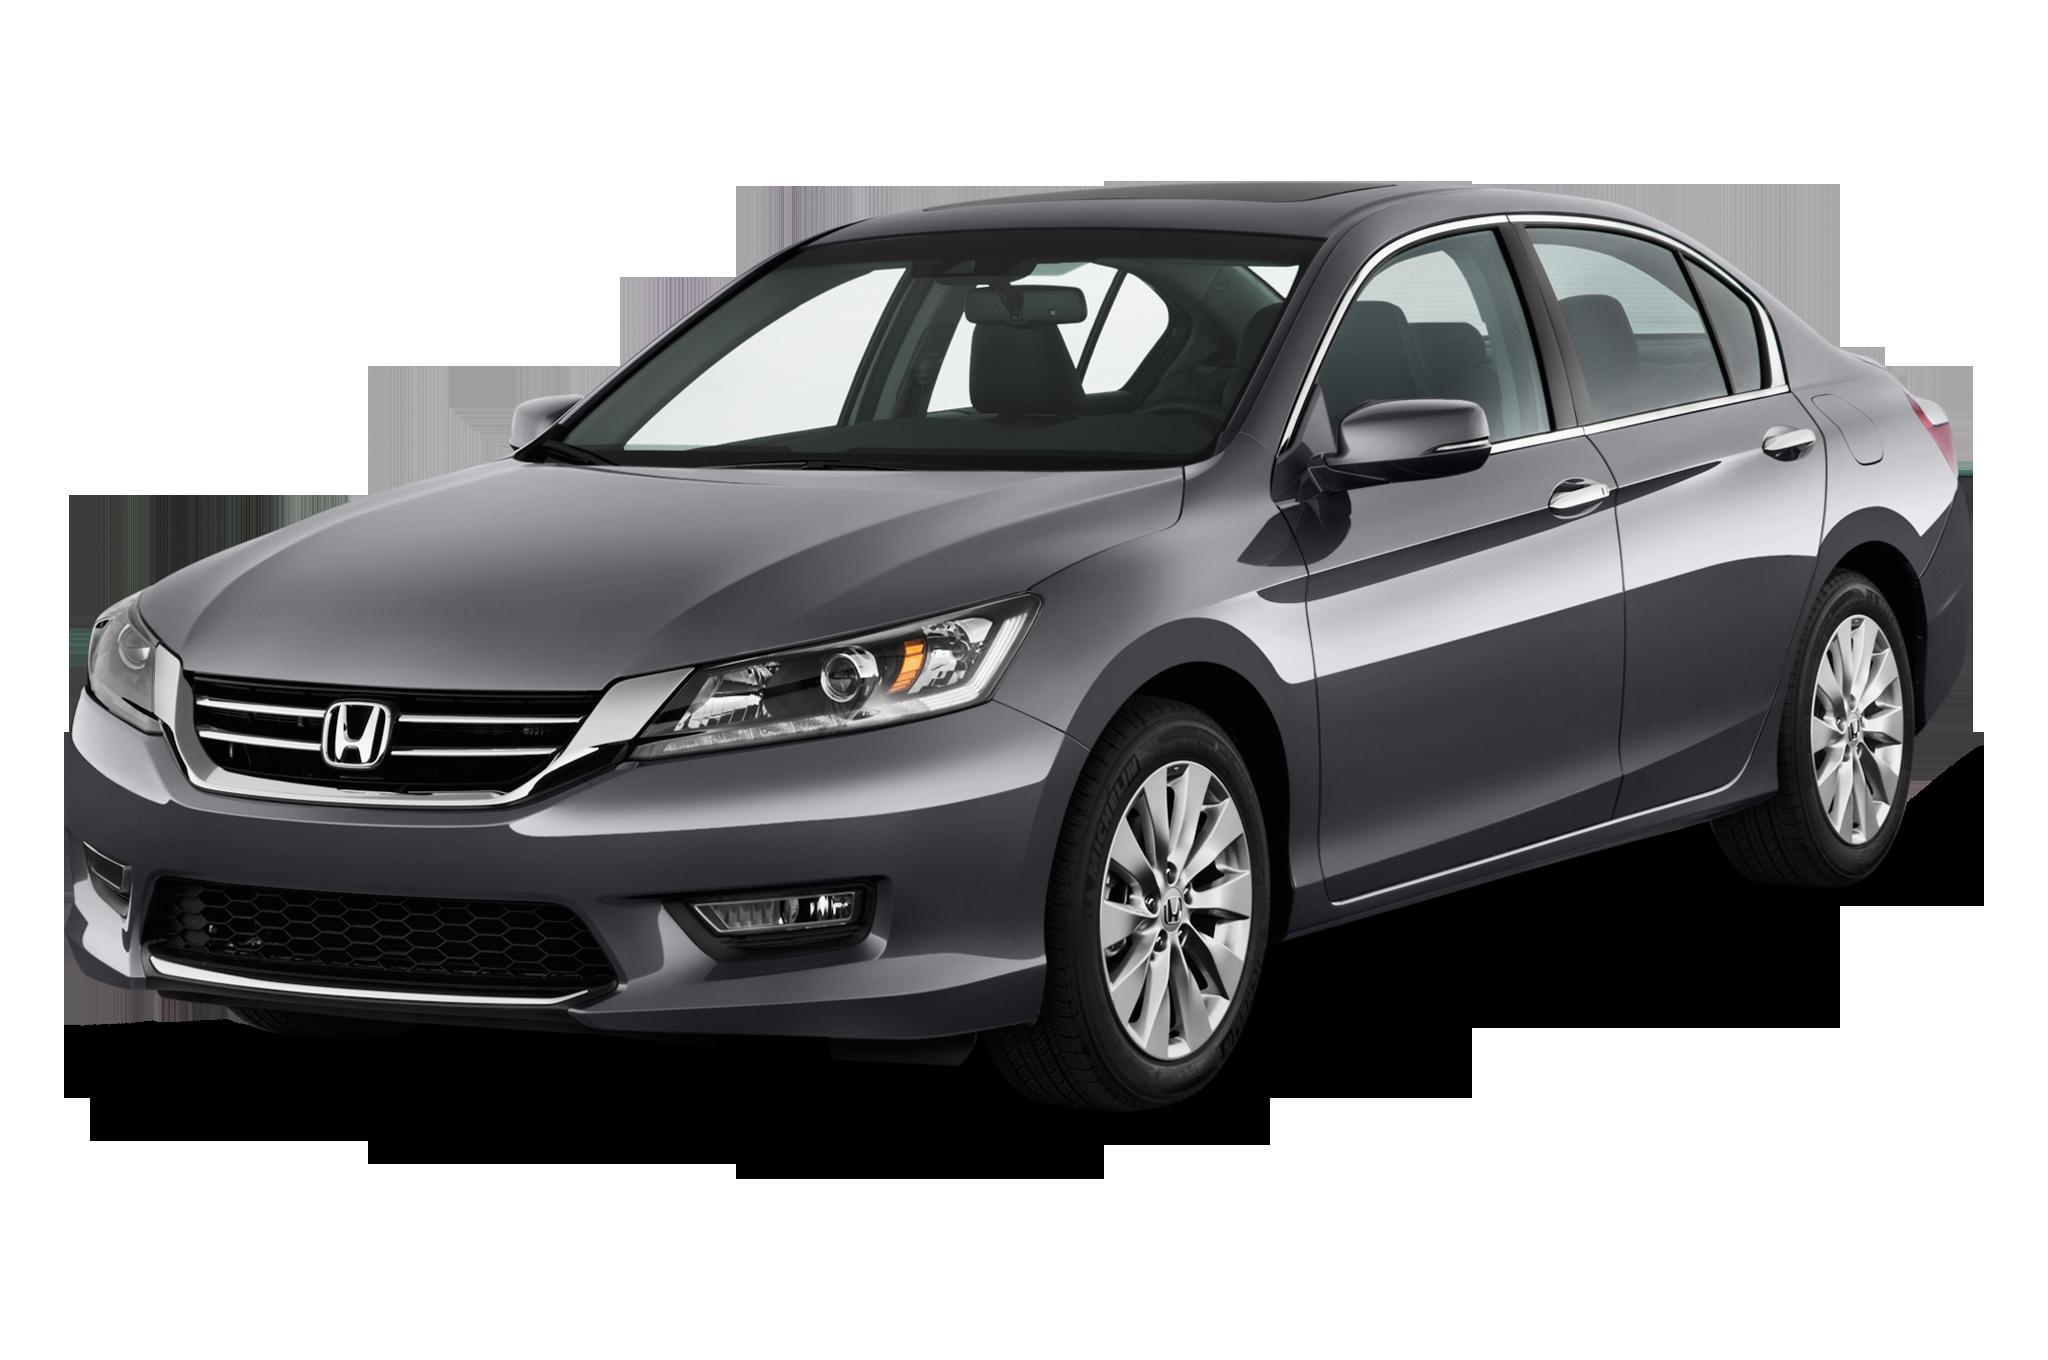 Image Result For Honda Accord Uglya